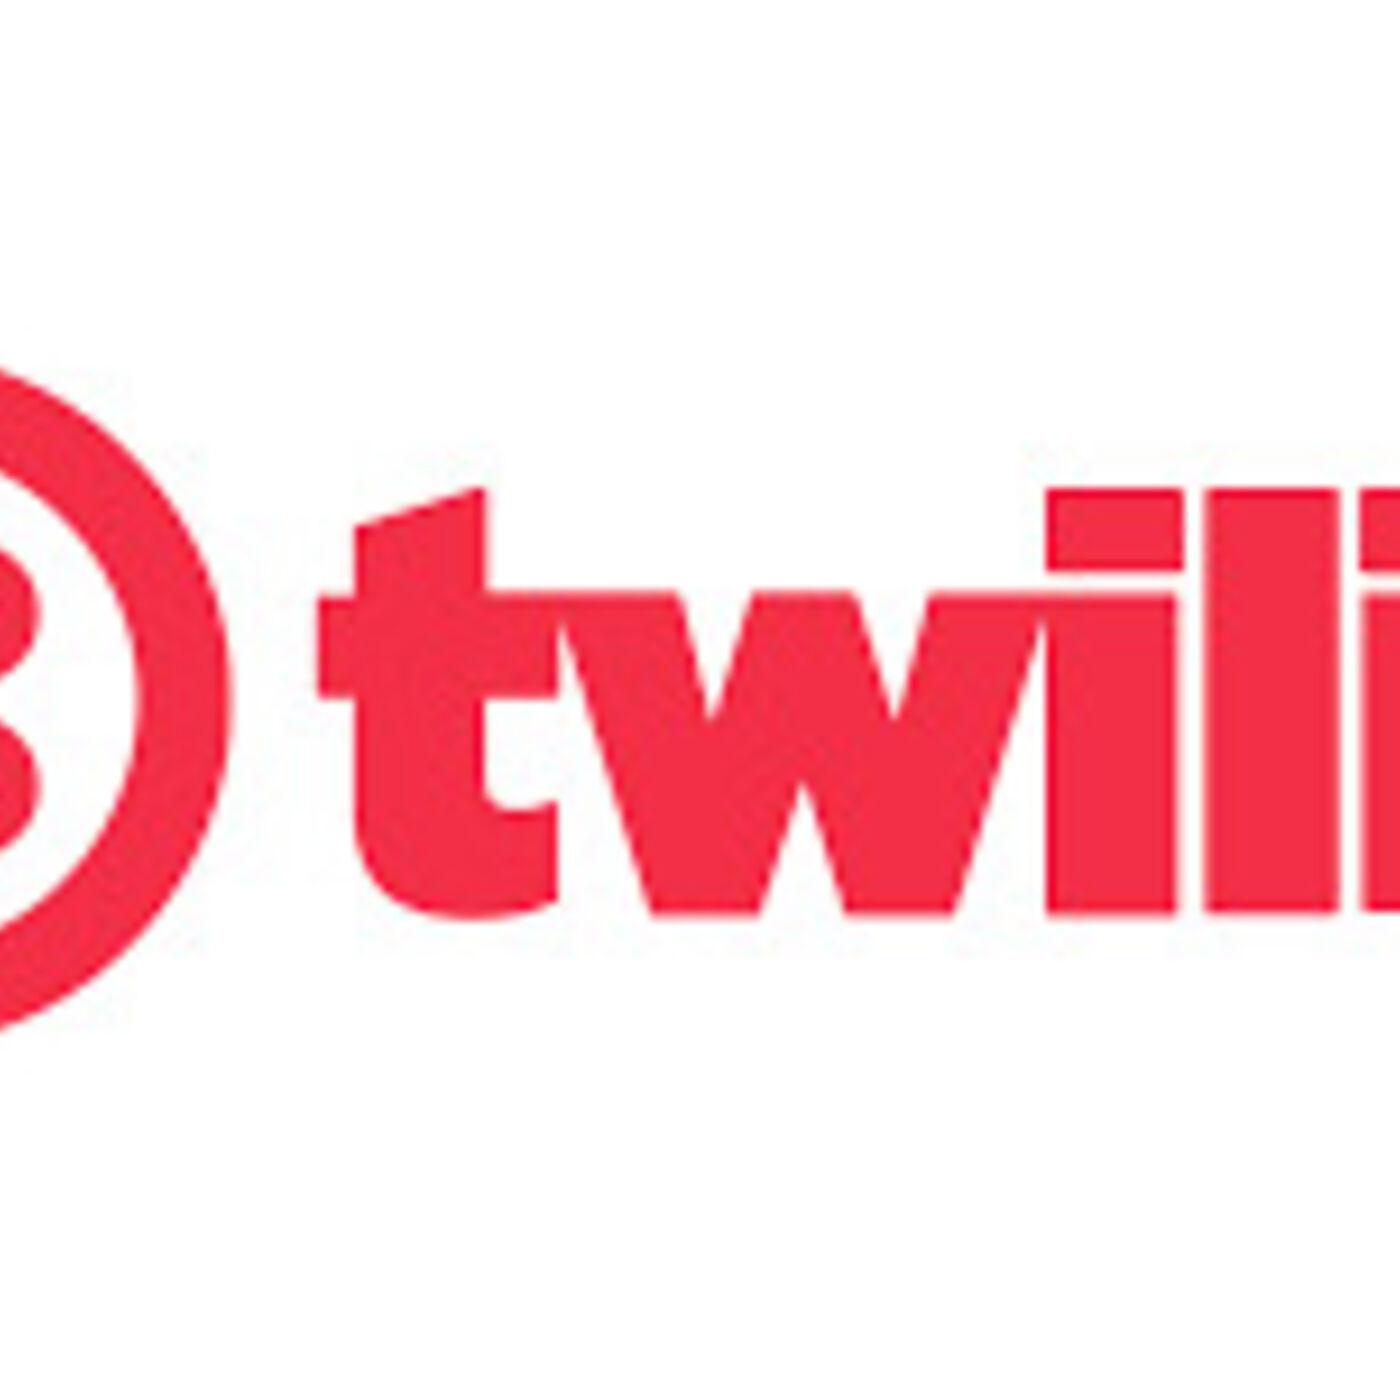 Twilio Presents: Consumerization in Healthcare for Patients and Providers